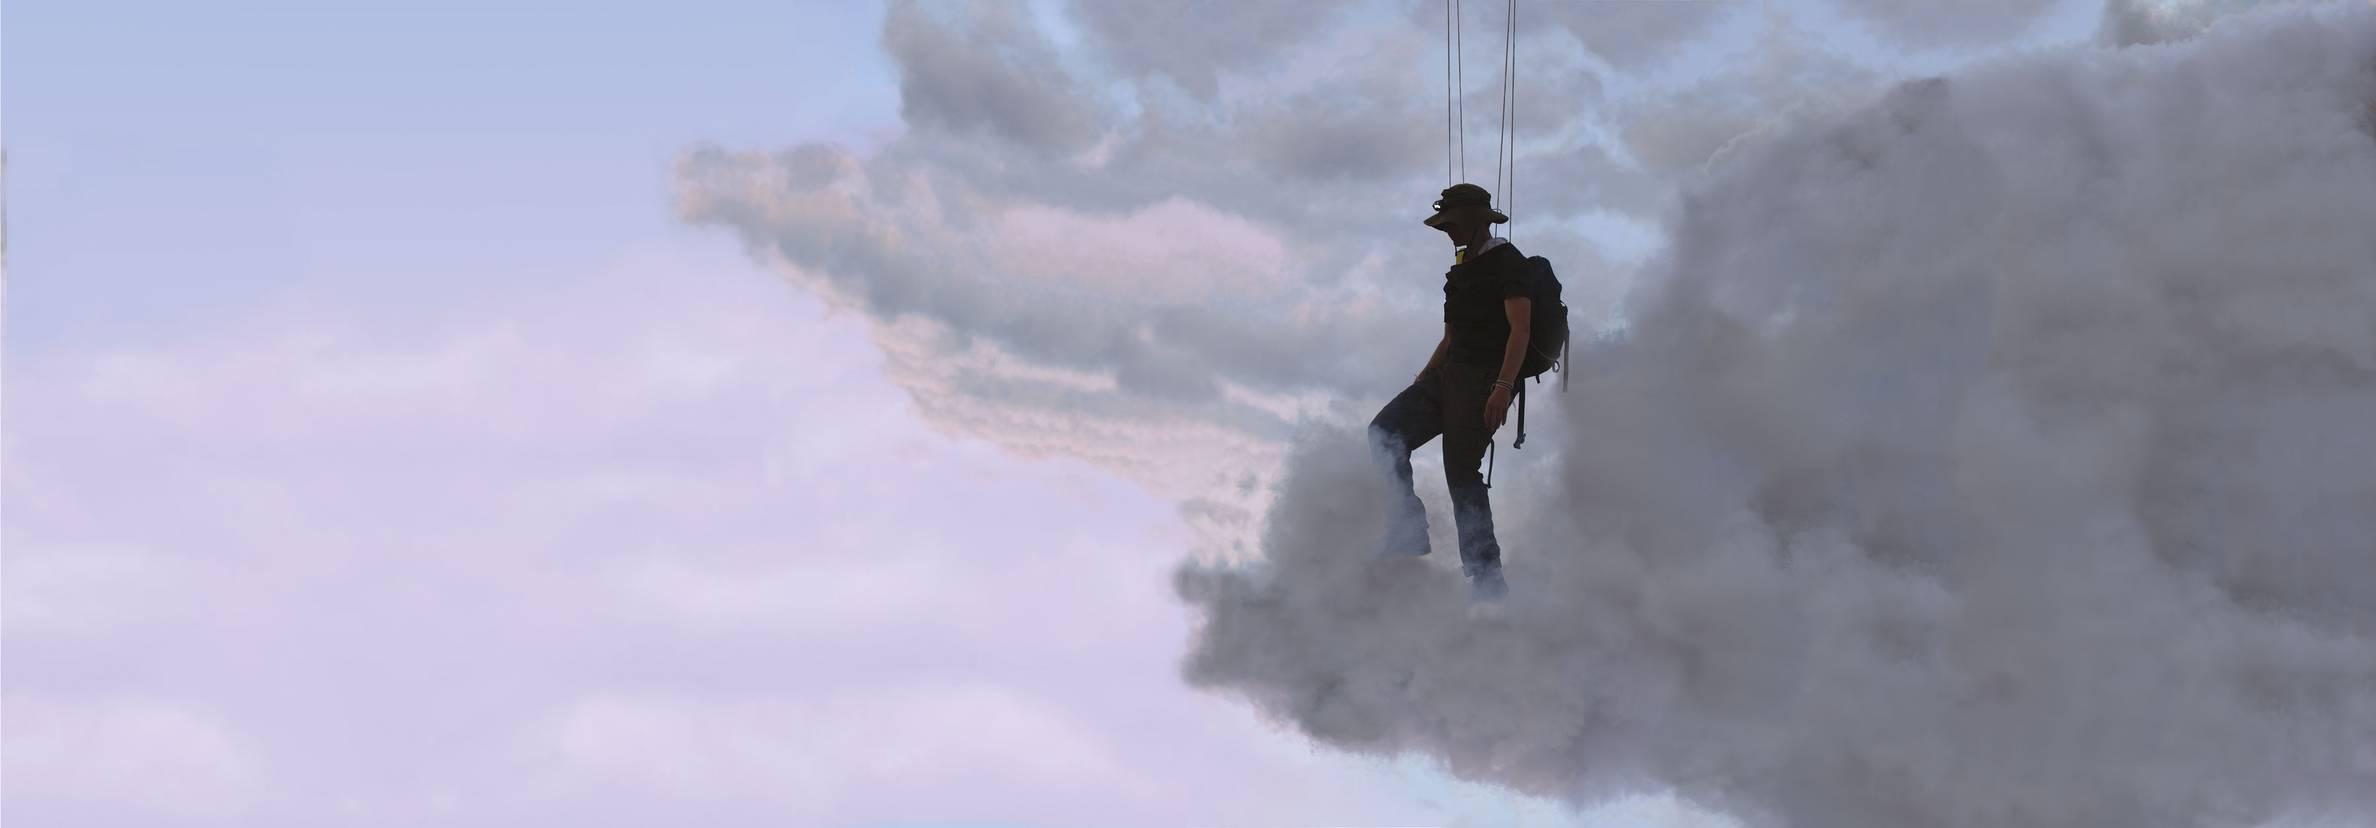 Abraham Poincheval, Walk on Clouds, 2020 Ruche - Hive, Abraham Poincheval, Marseille (FR) 11 septembre - 29 novembre 2020